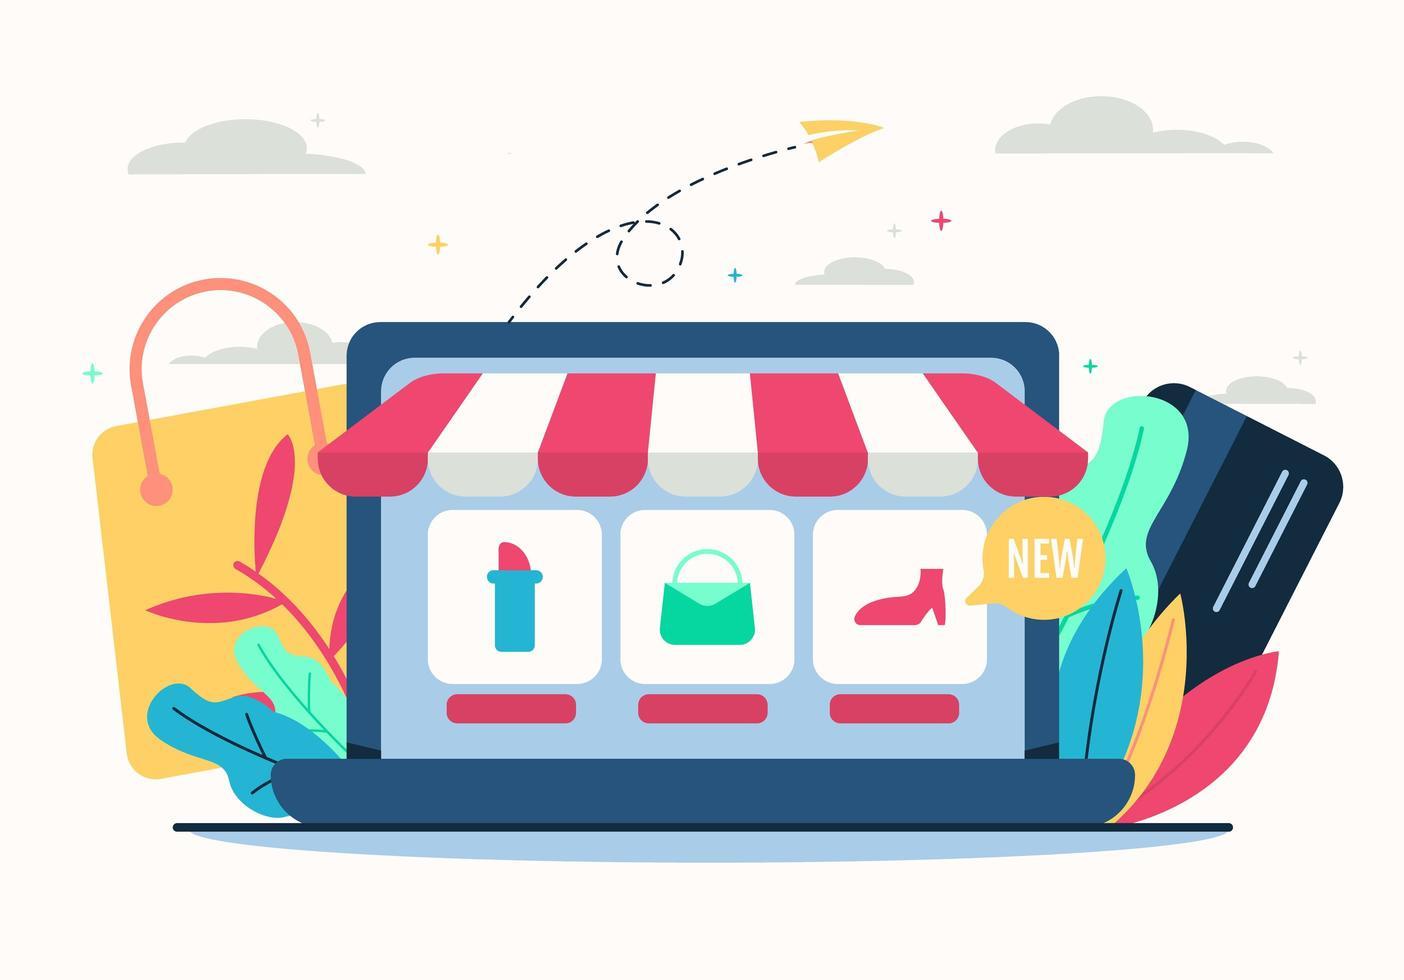 Online-Shop-Illustration in flachem Design vektor